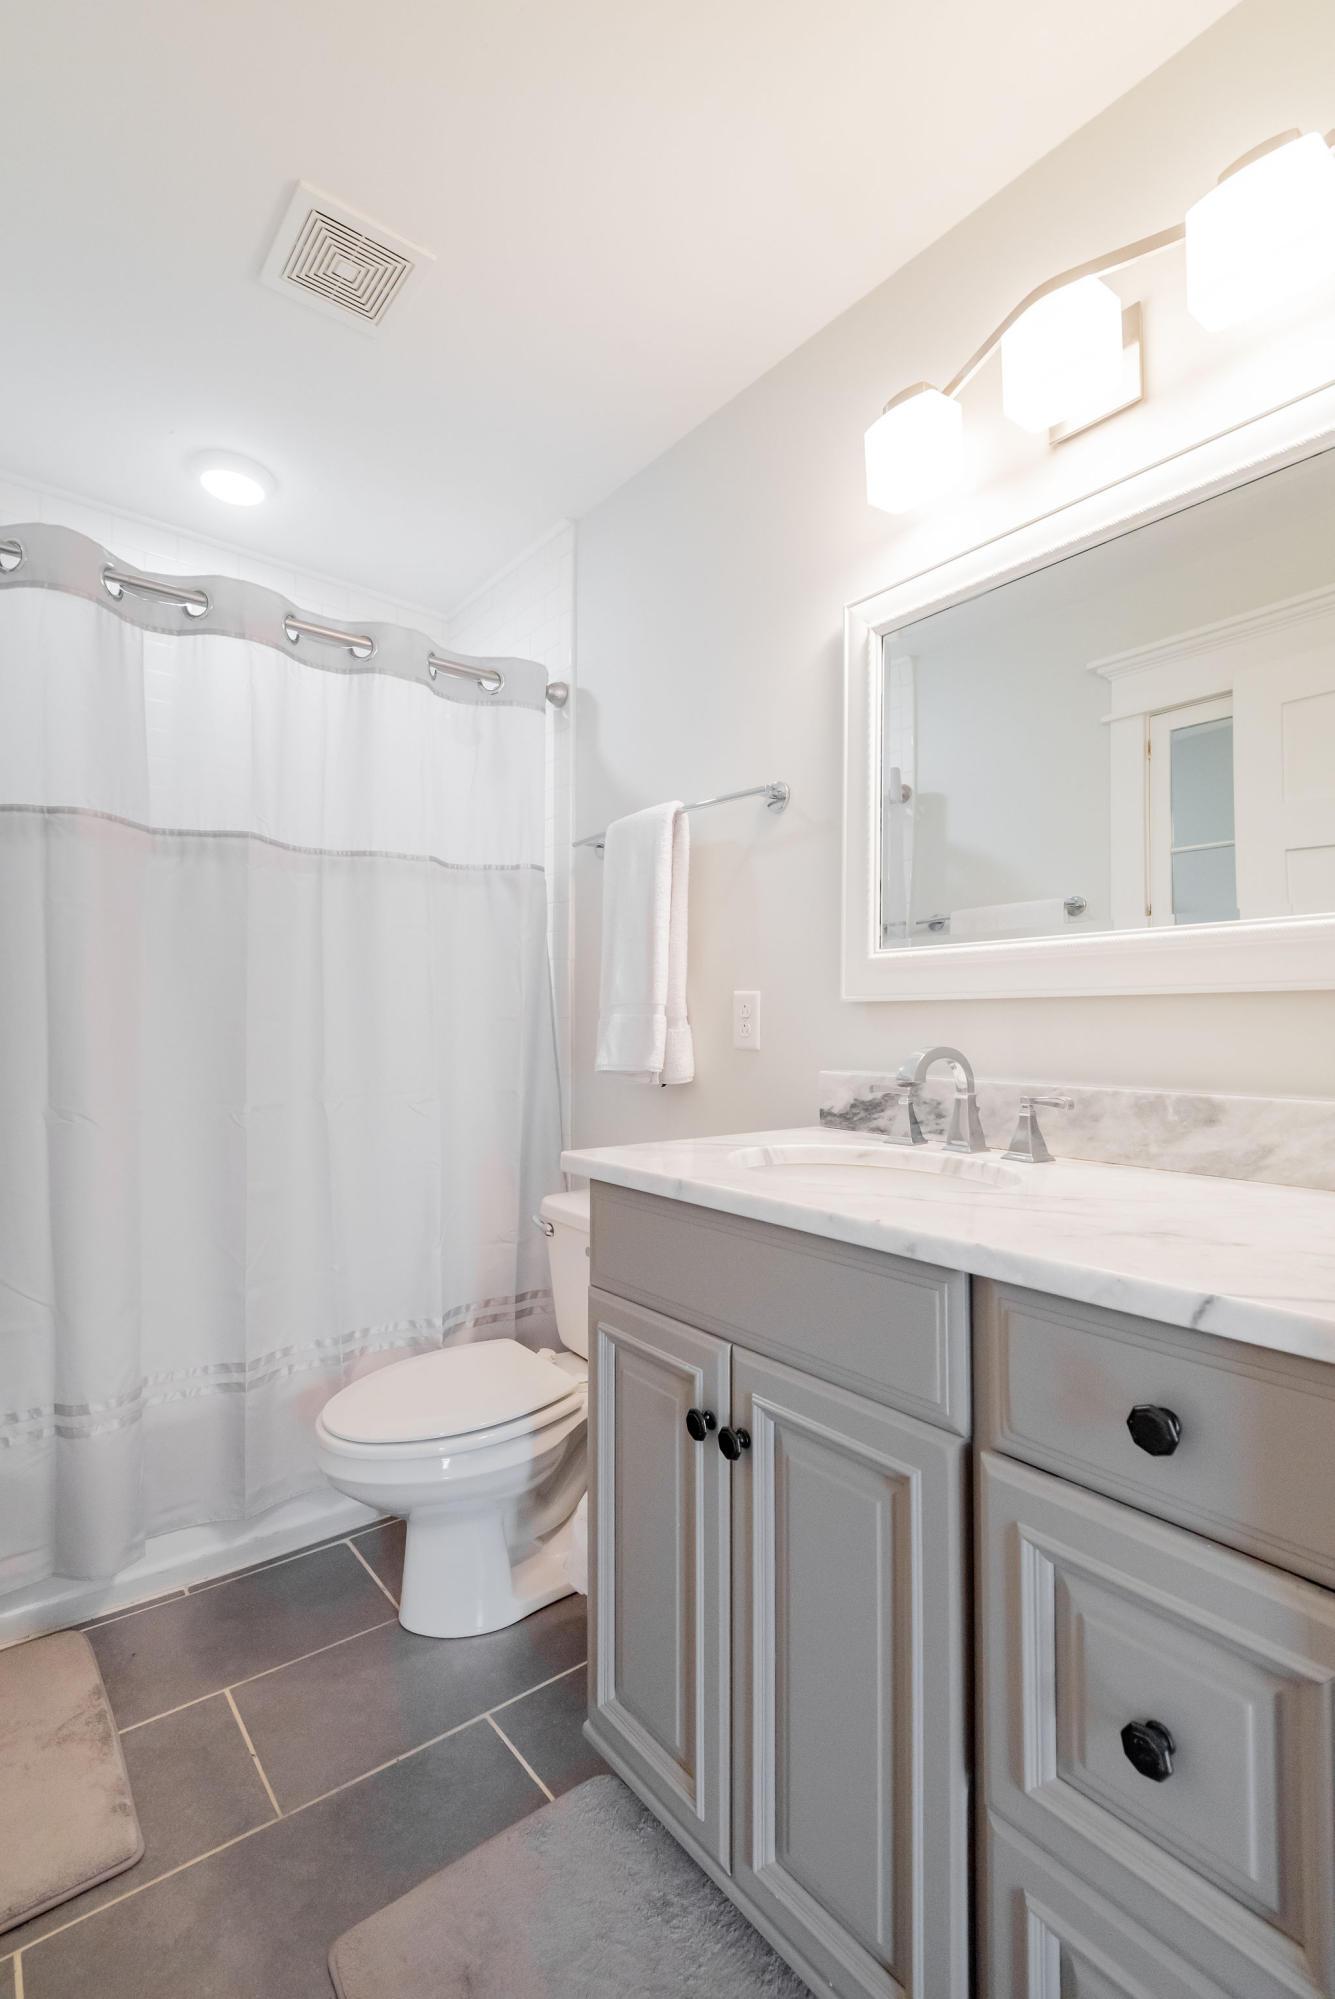 Elliotborough Homes For Sale - 29 Sires, Charleston, SC - 5